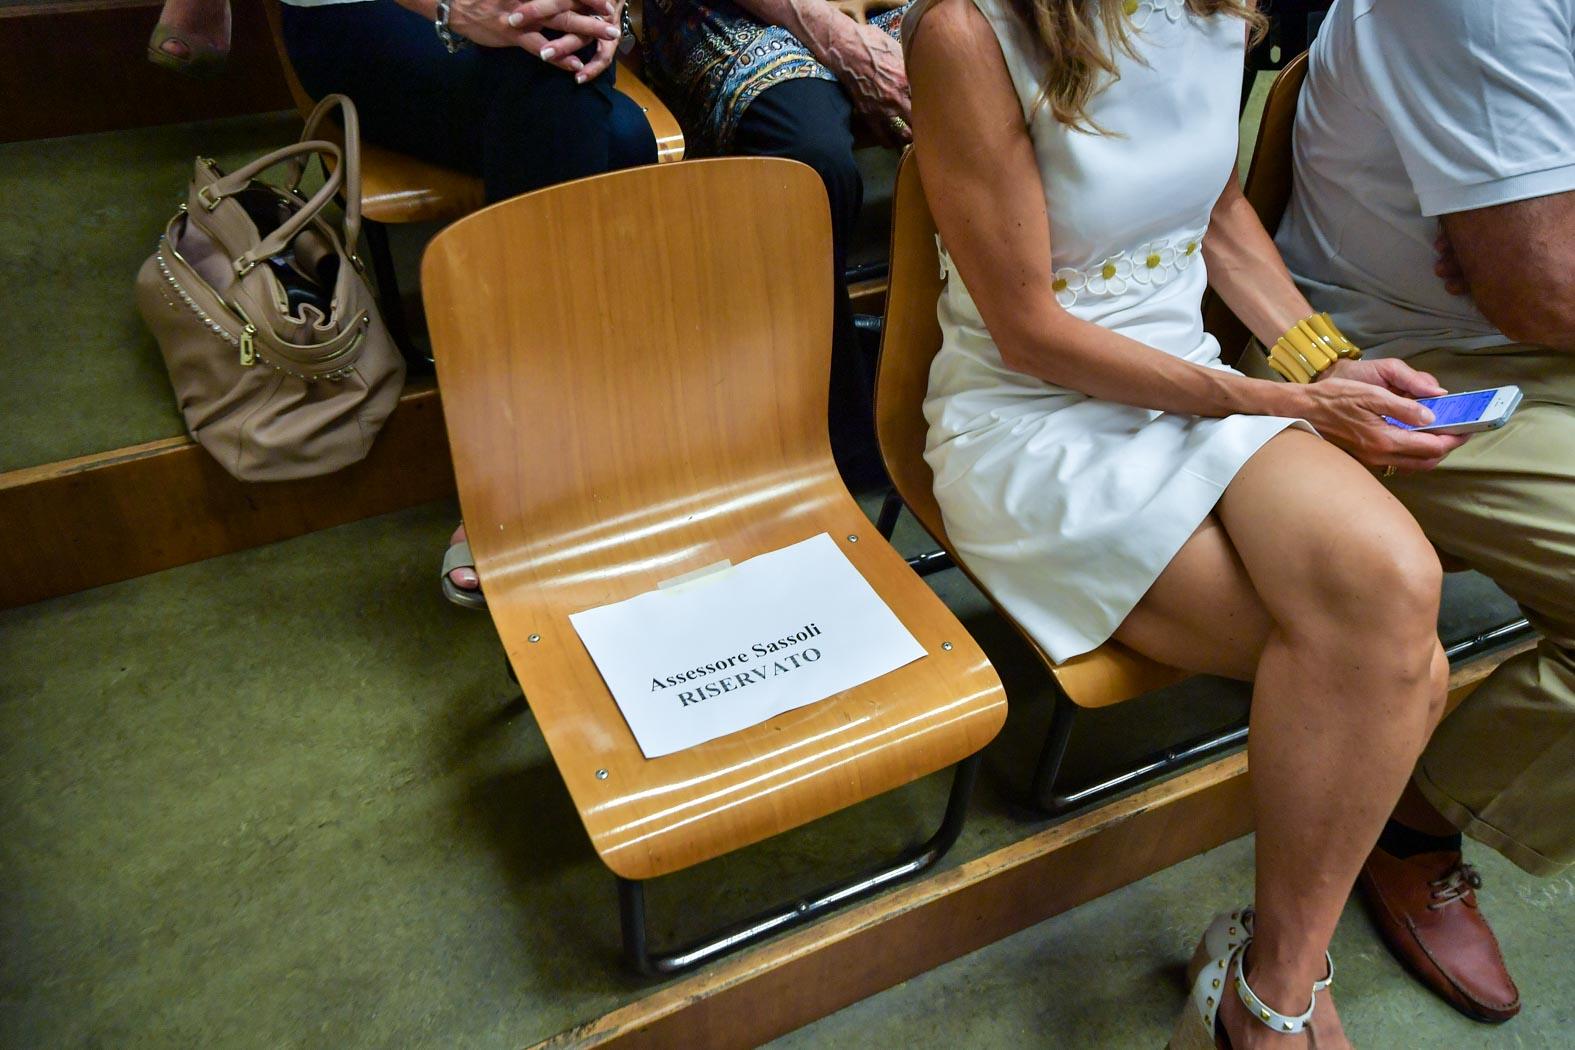 giunta allevi consiglio cani sedia vuota sassoli